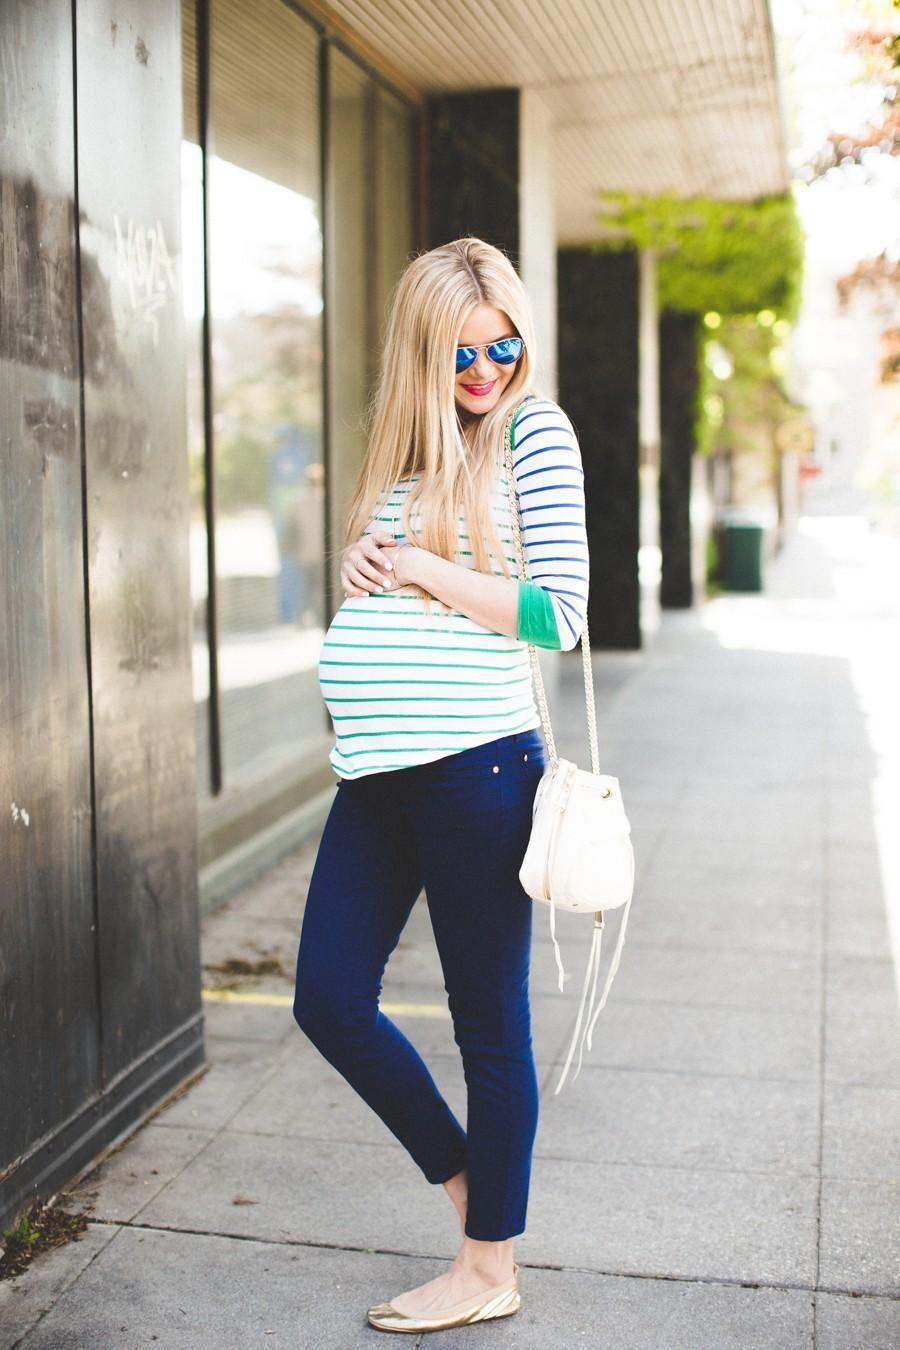 e42cc214a Chica embarazada usando una blusa color verde y pantalón de mezclilla  #pregnancyoutfits Cute Maternity Style